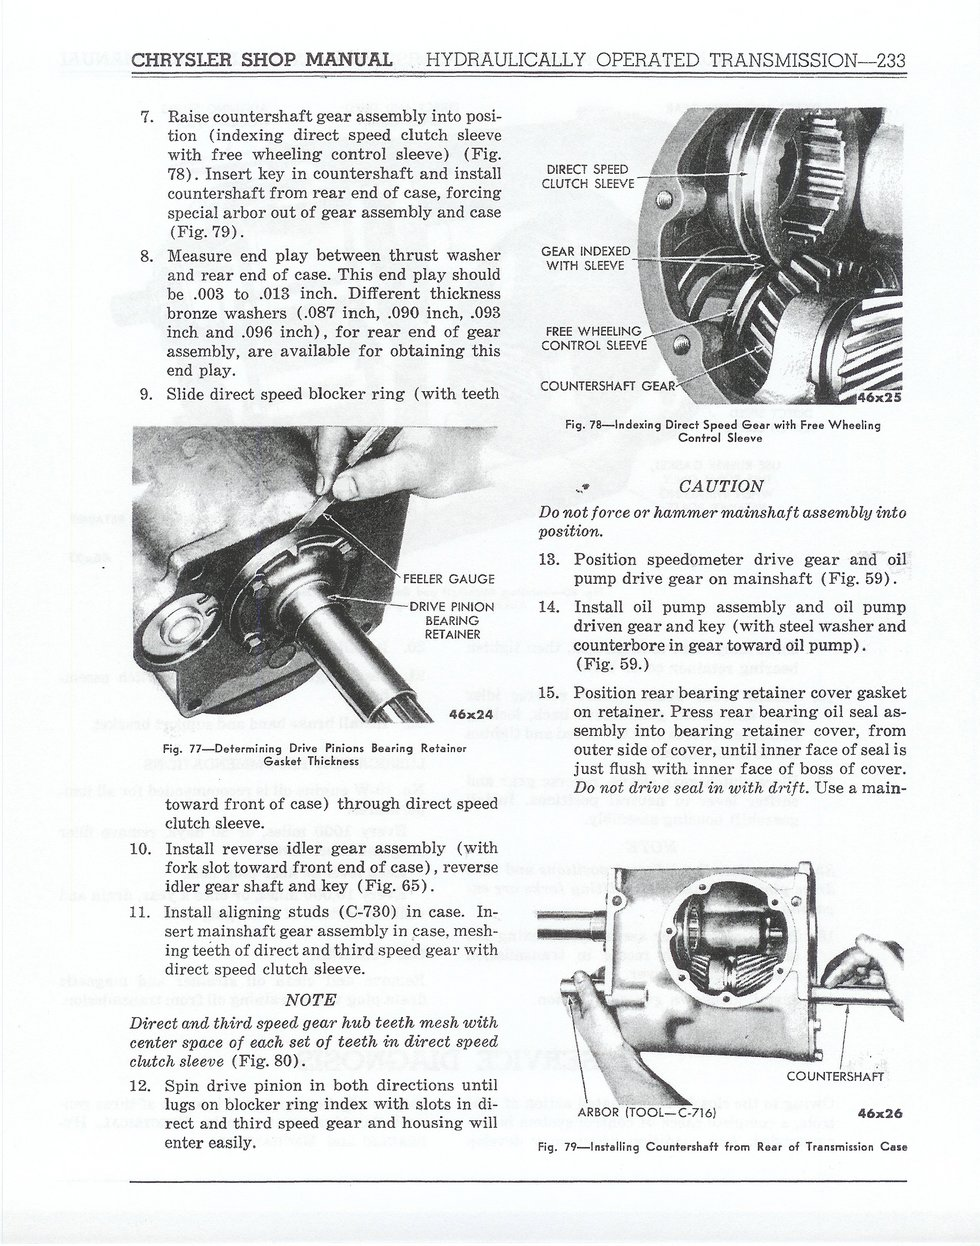 1941 Chrysler Shop Manual